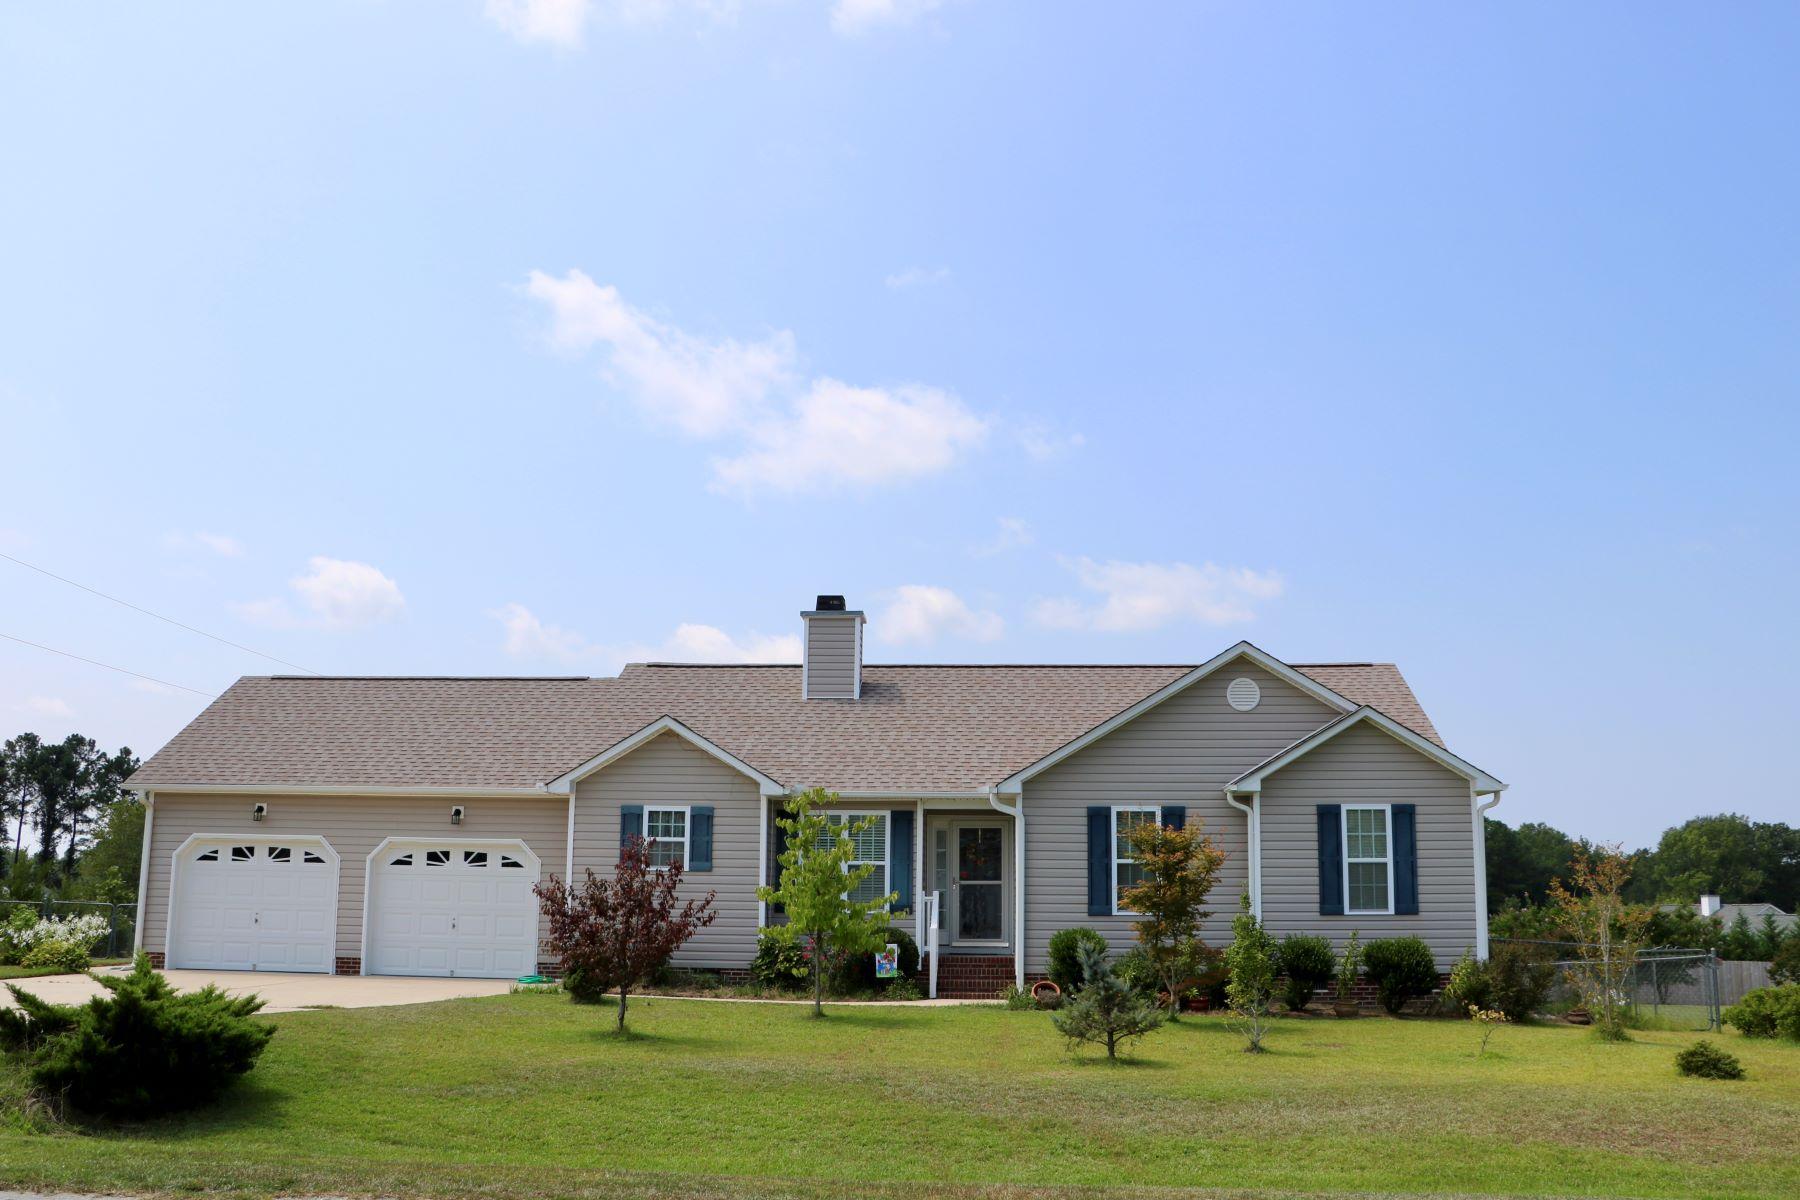 Single Family Homes για την Πώληση στο 11 Cirrus Drive, Clayton, NC Clayton, Βορεια Καρολινα 27520 Ηνωμένες Πολιτείες